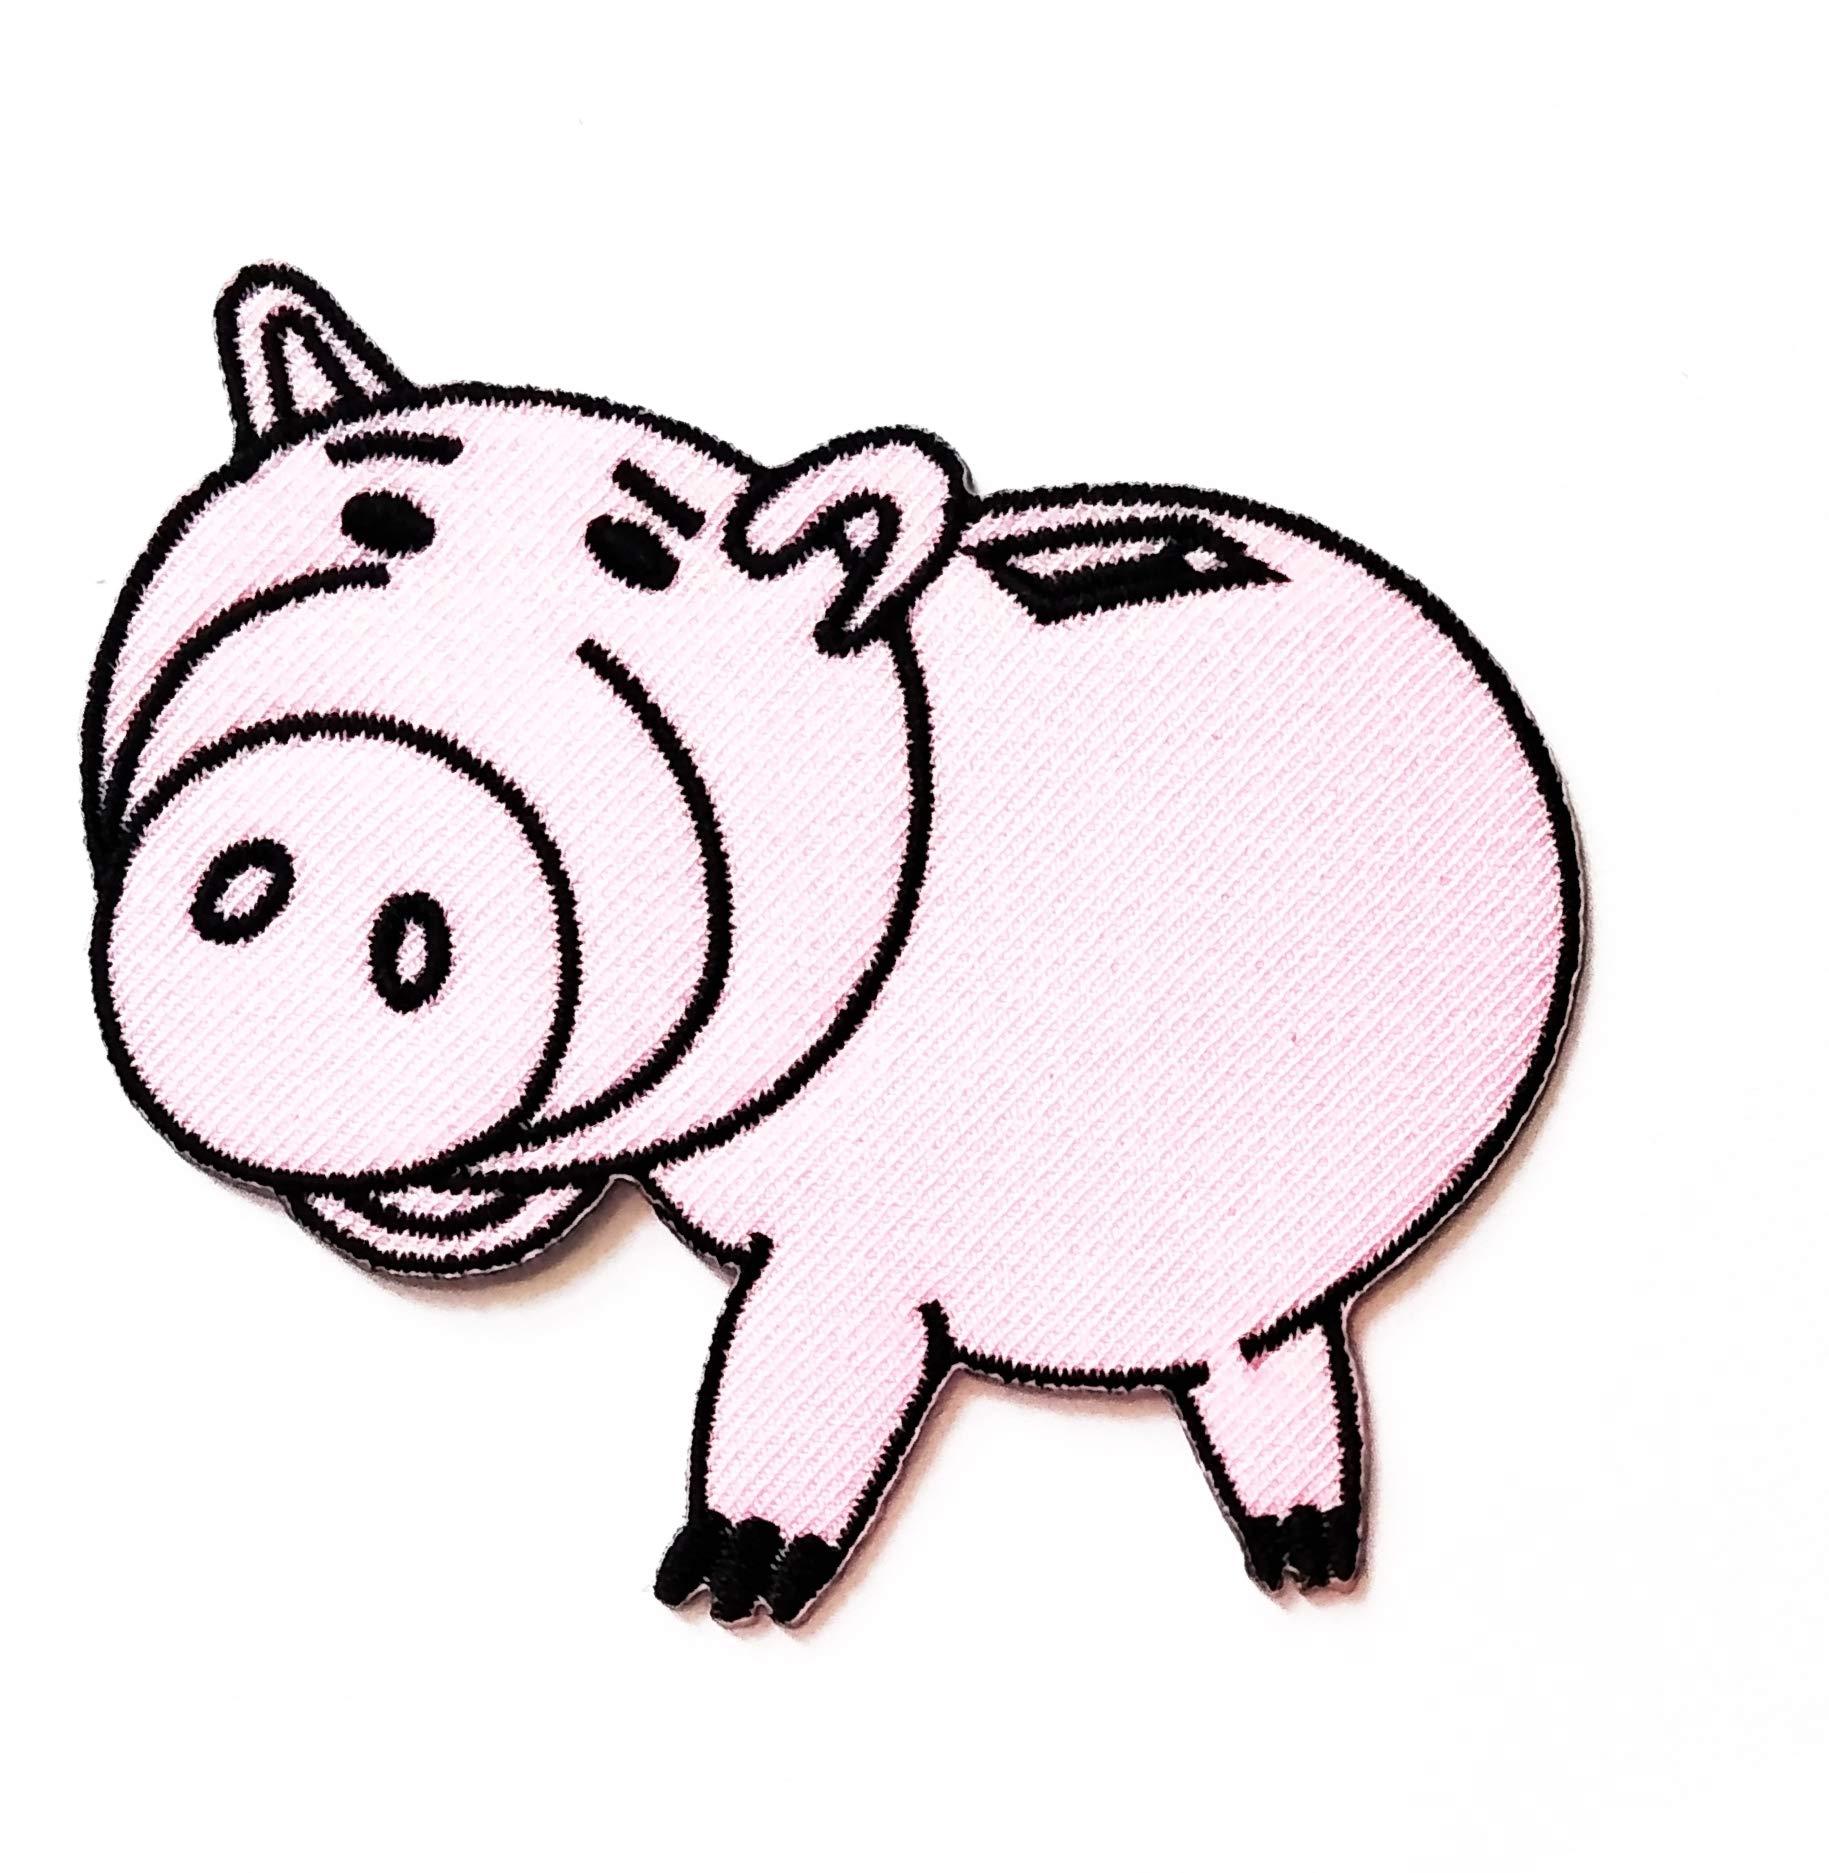 Nipitshop Patches Cute Pretty Pig Stand Farm Animal